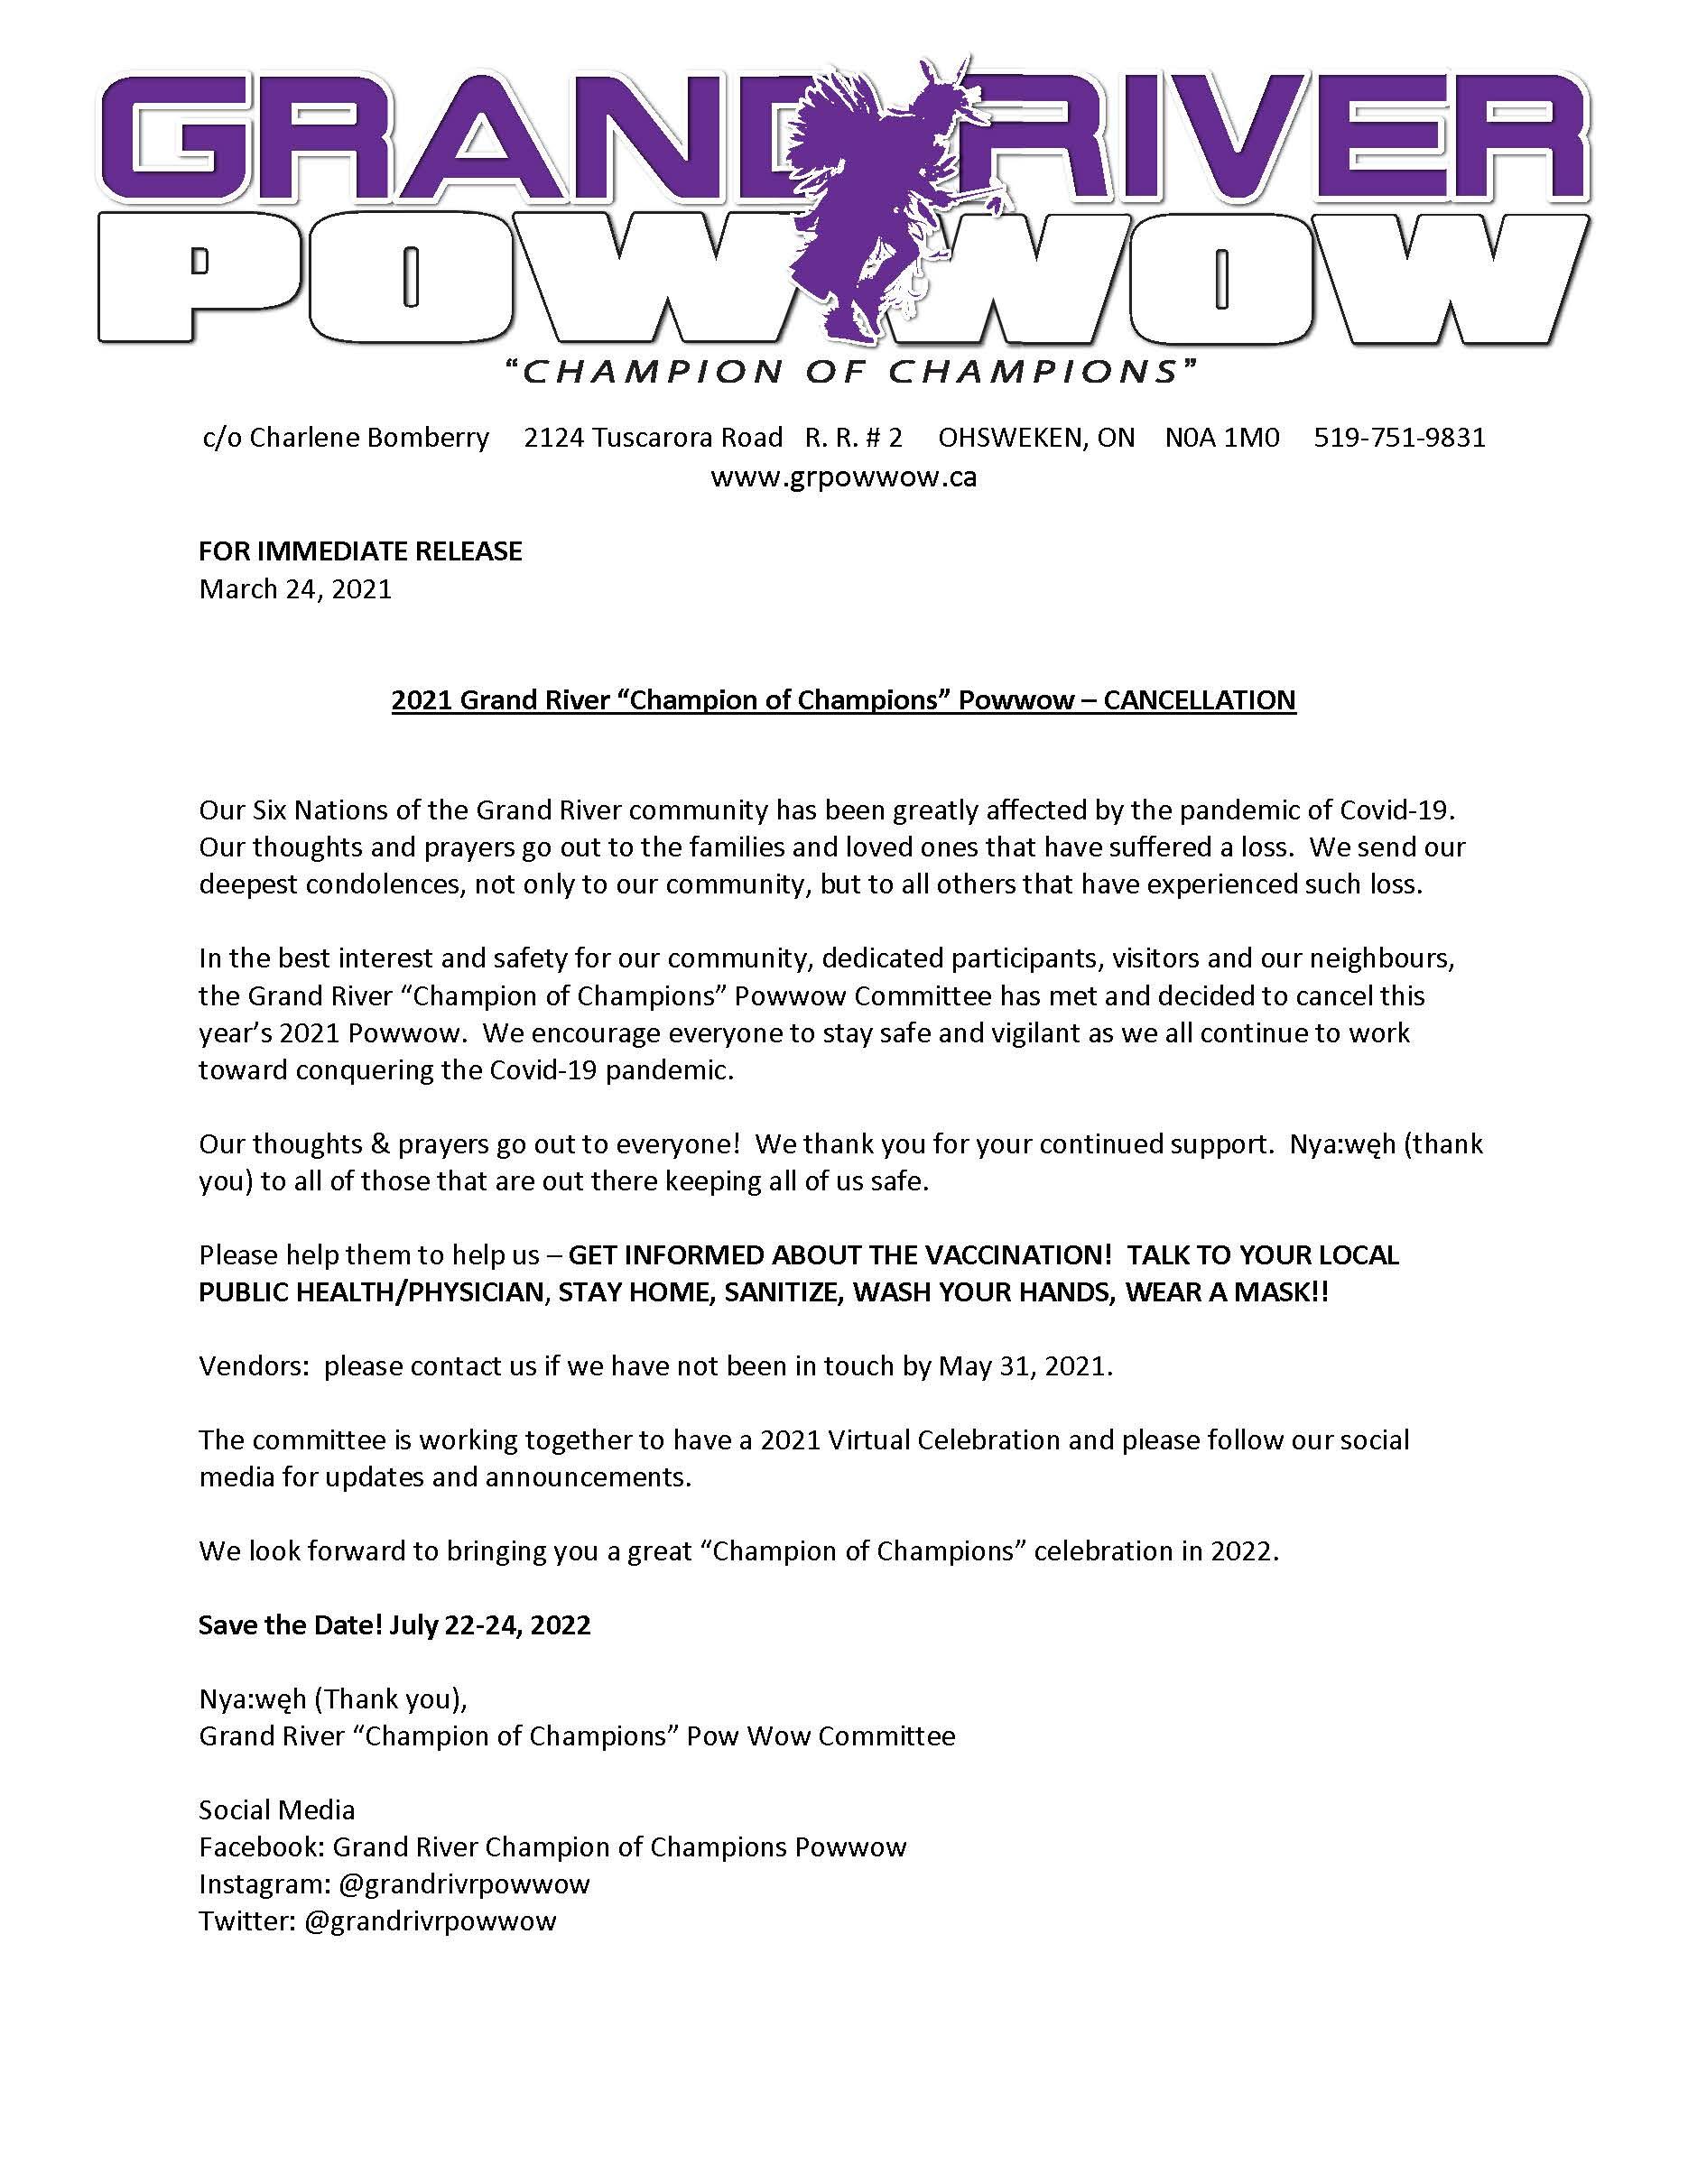 2021 Cancellation announcement